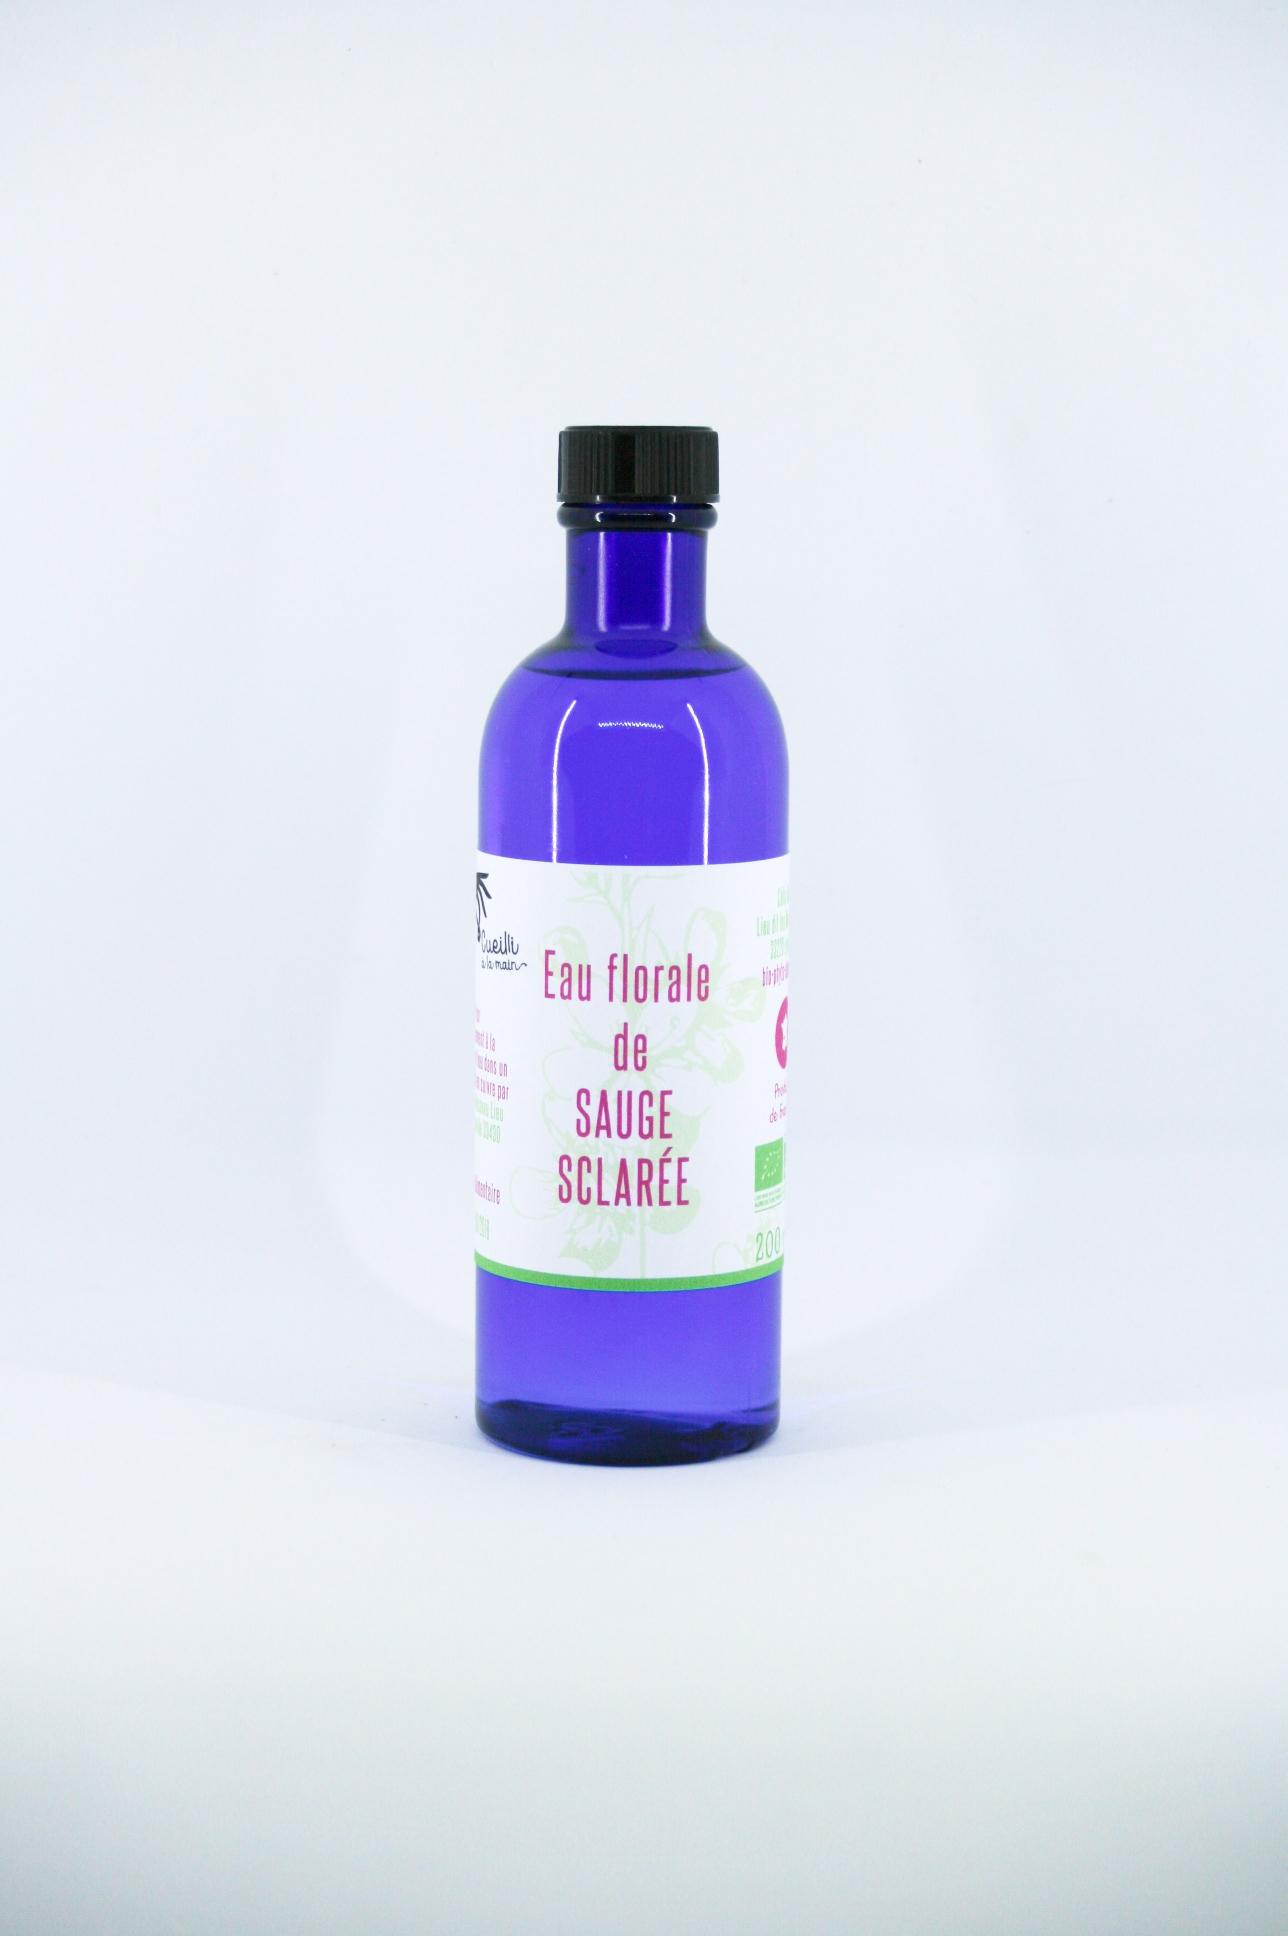 eau florale sauge sclaree bio